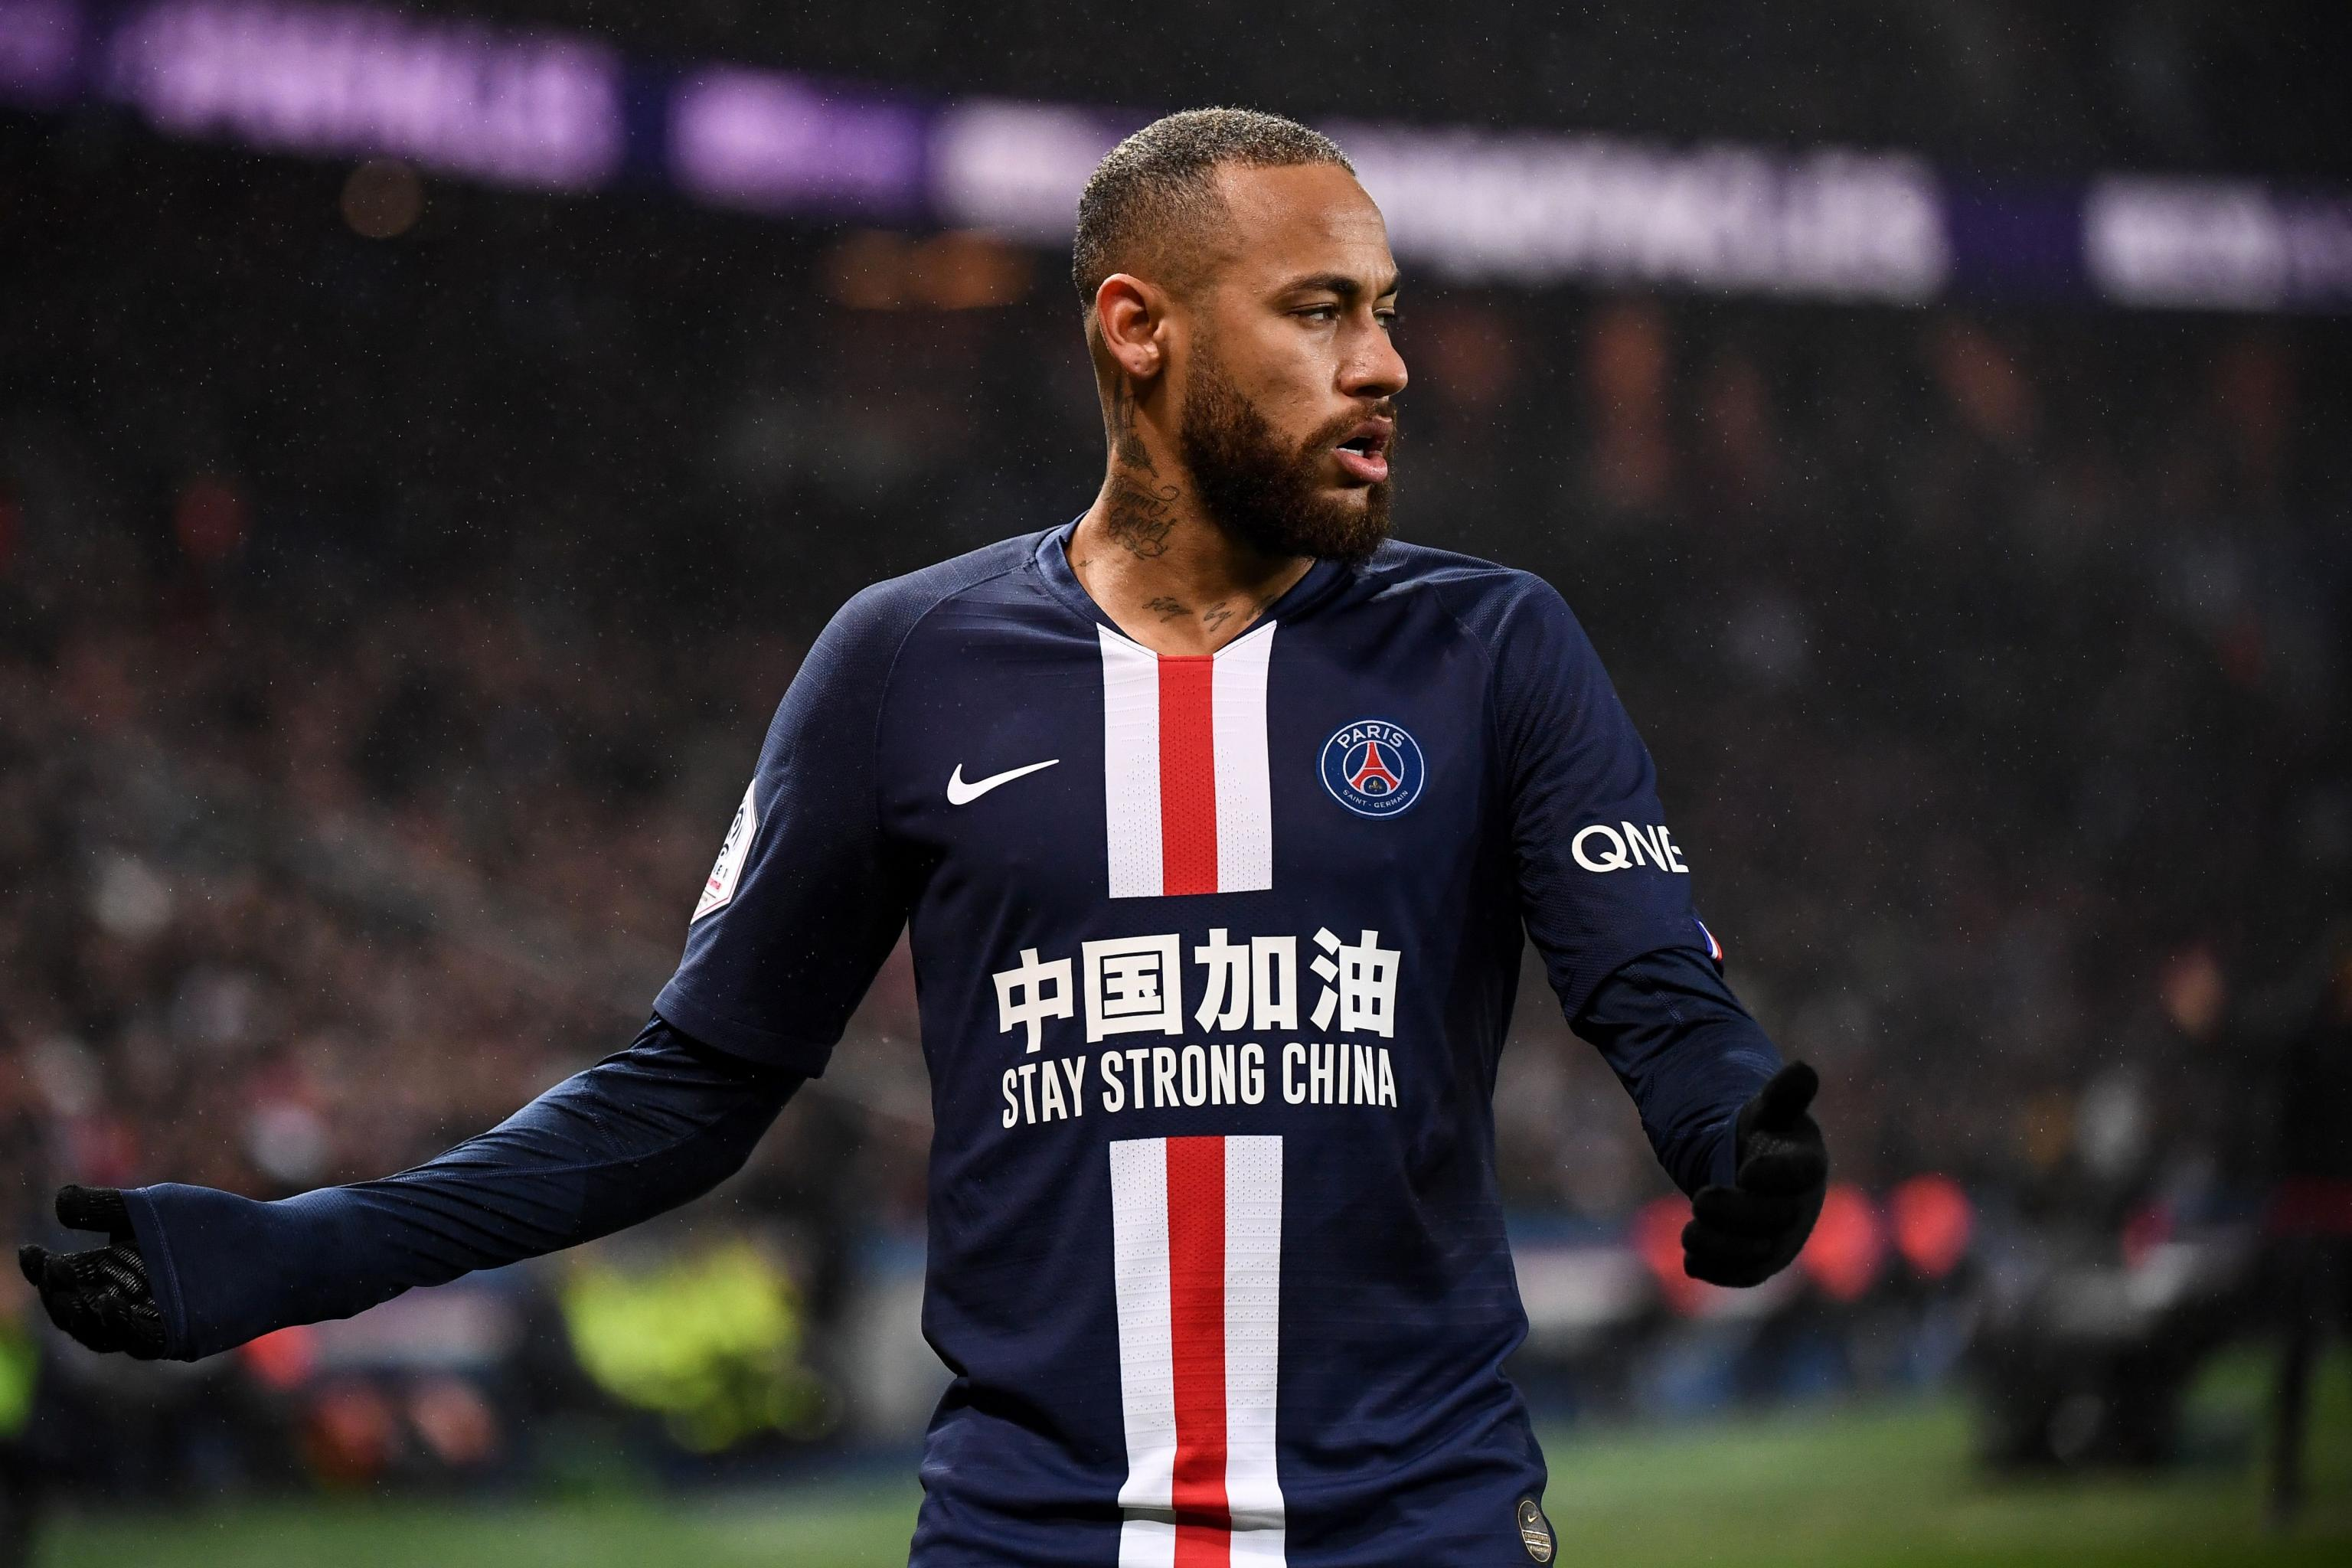 Neymar Sent Off Edinson Cavani Scores 200th Psg Goal In Win Vs Bordeaux Bleacher Report Latest News Videos And Highlights